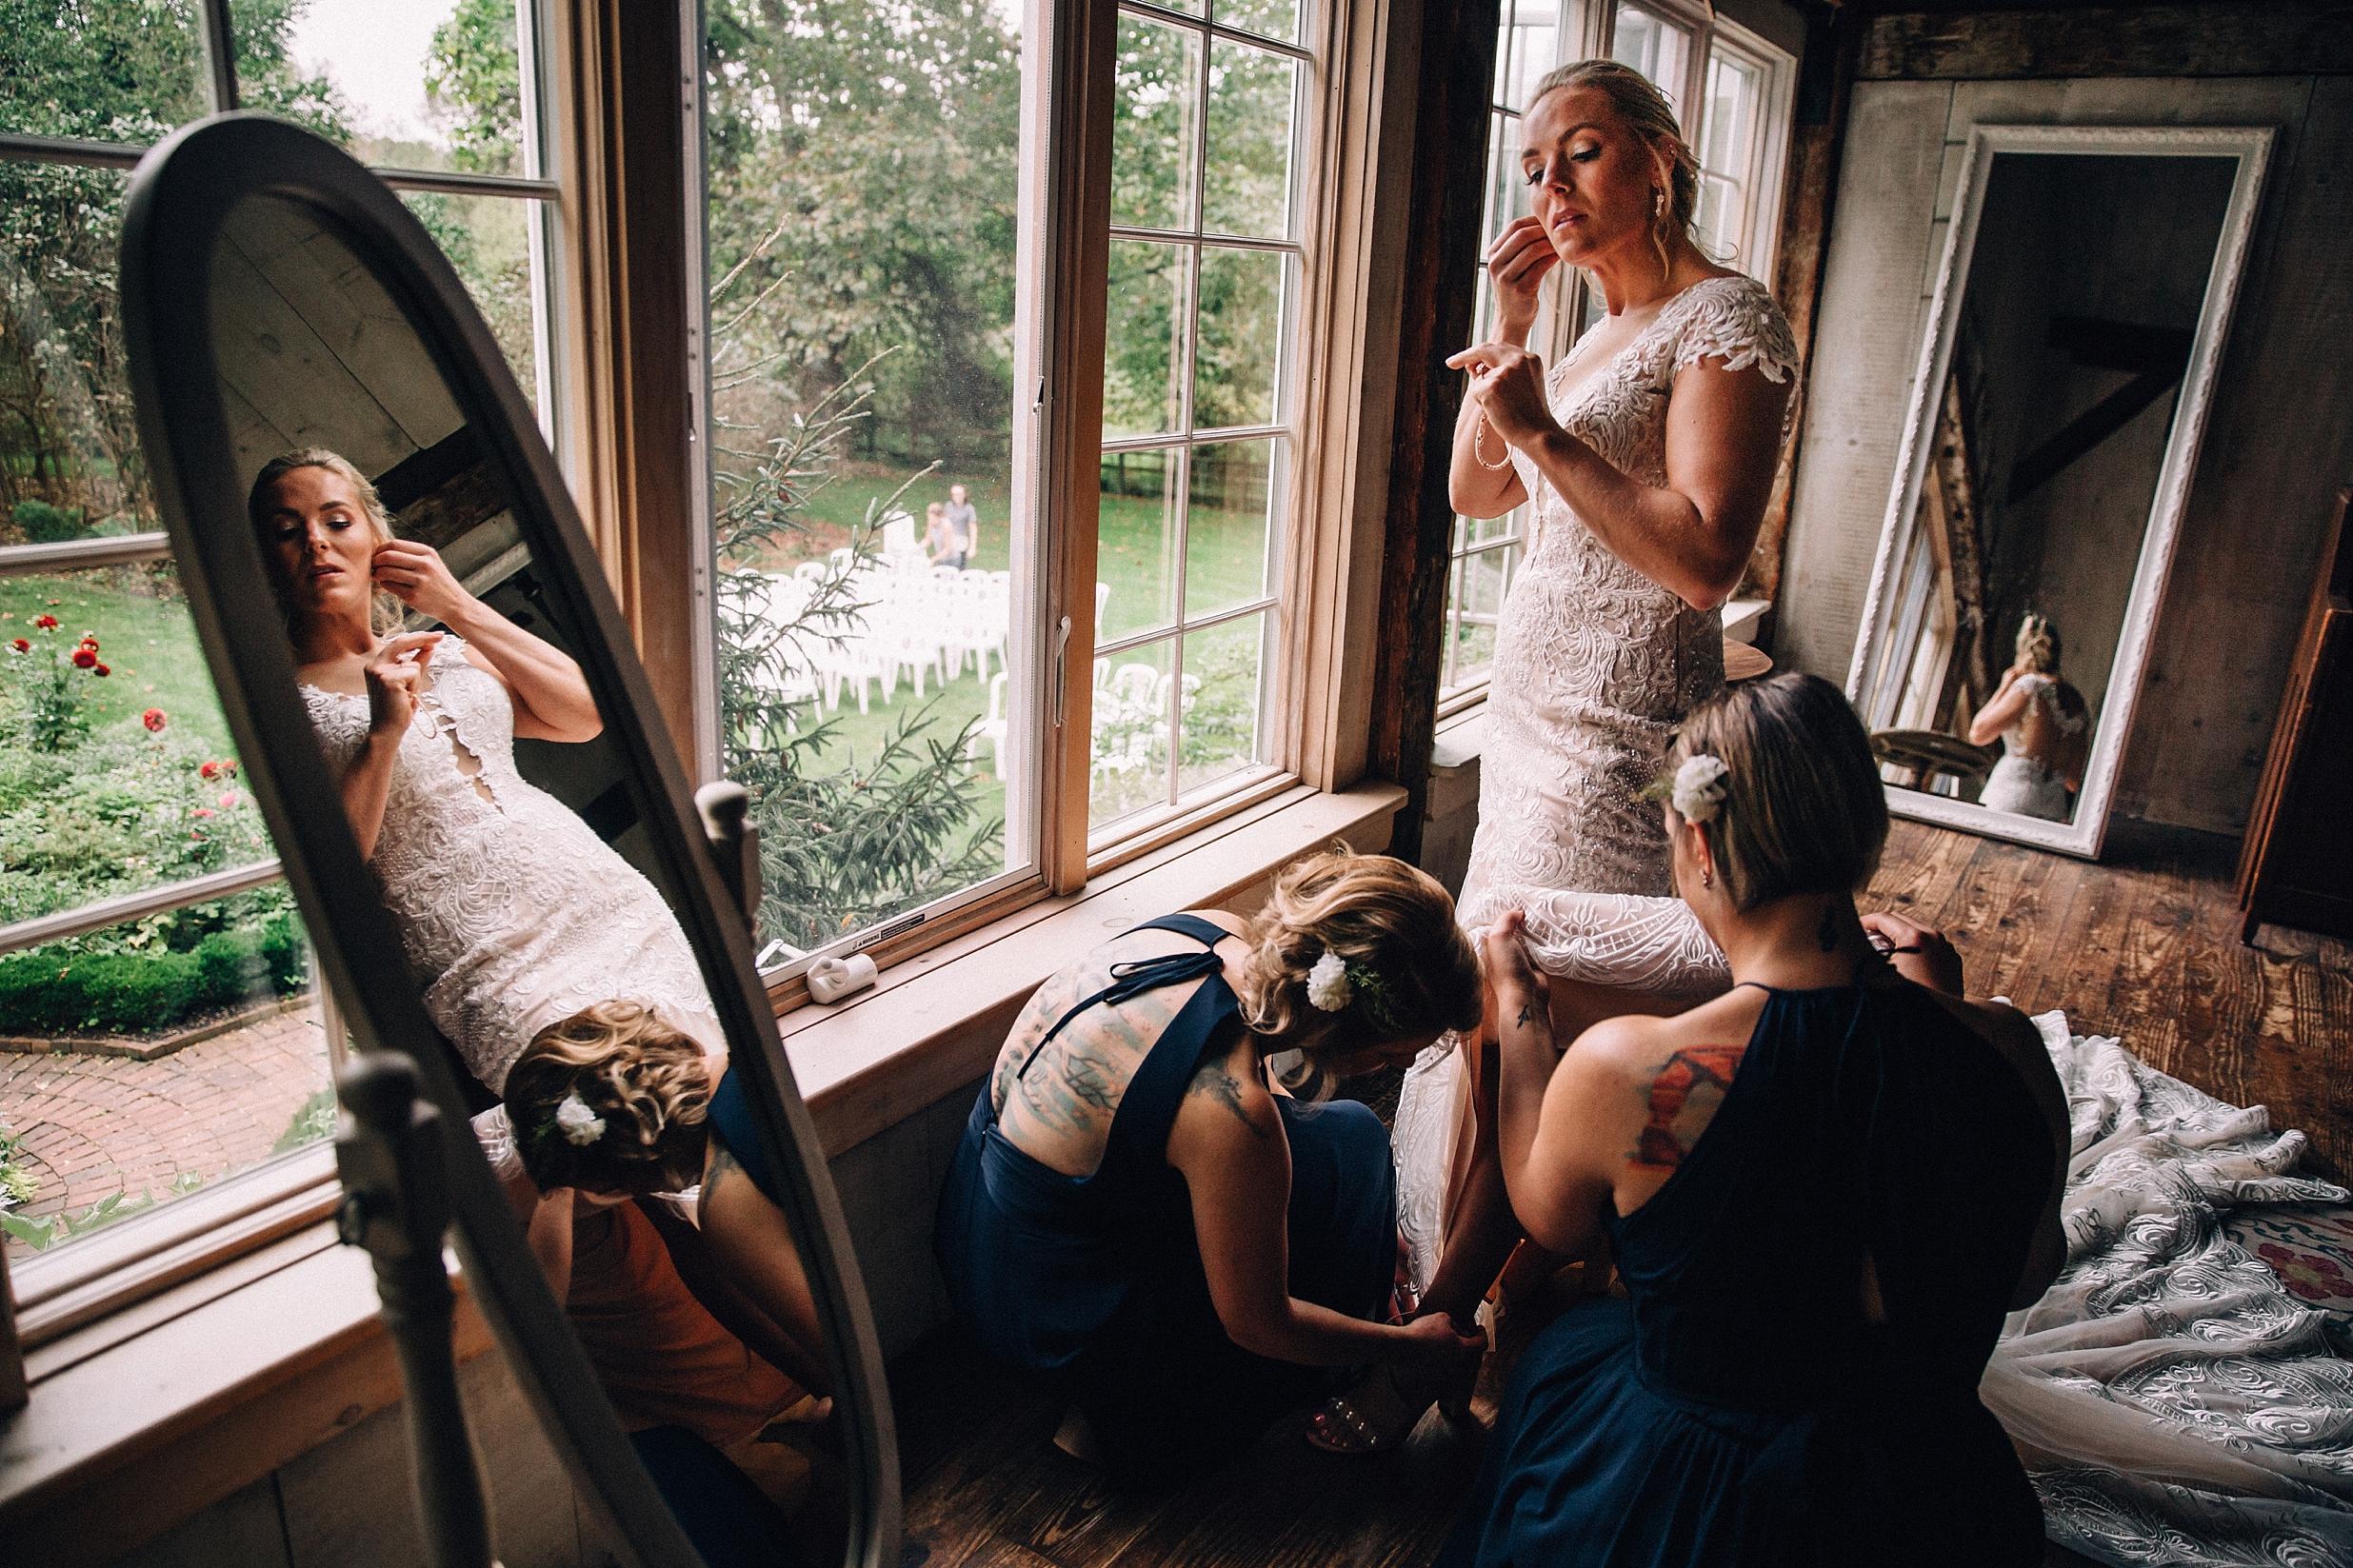 crossed-keys-outdoor-ceremony-camp-wedding-photo_0011.jpg